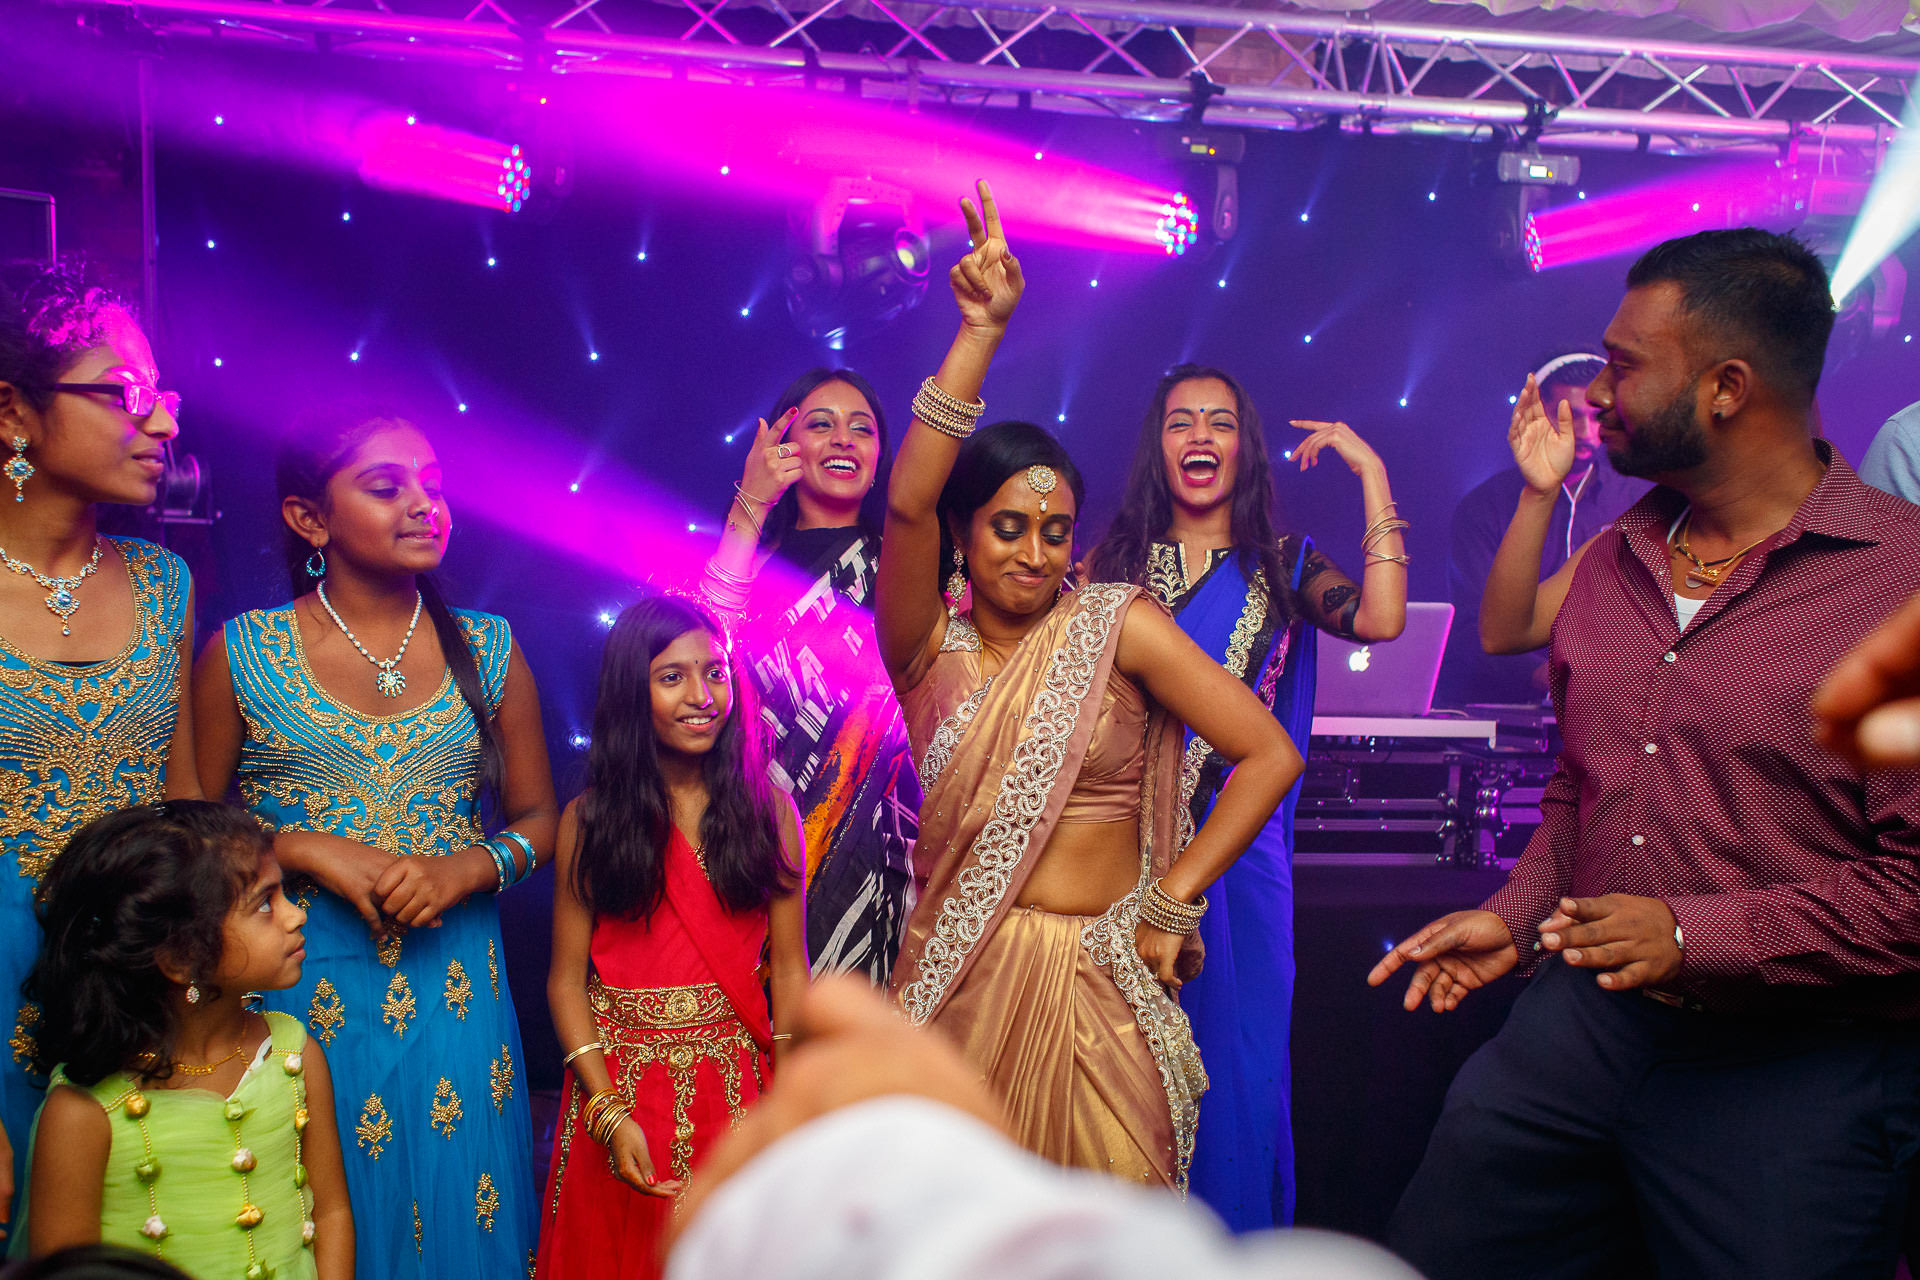 Tamil Wedding Dance Party London